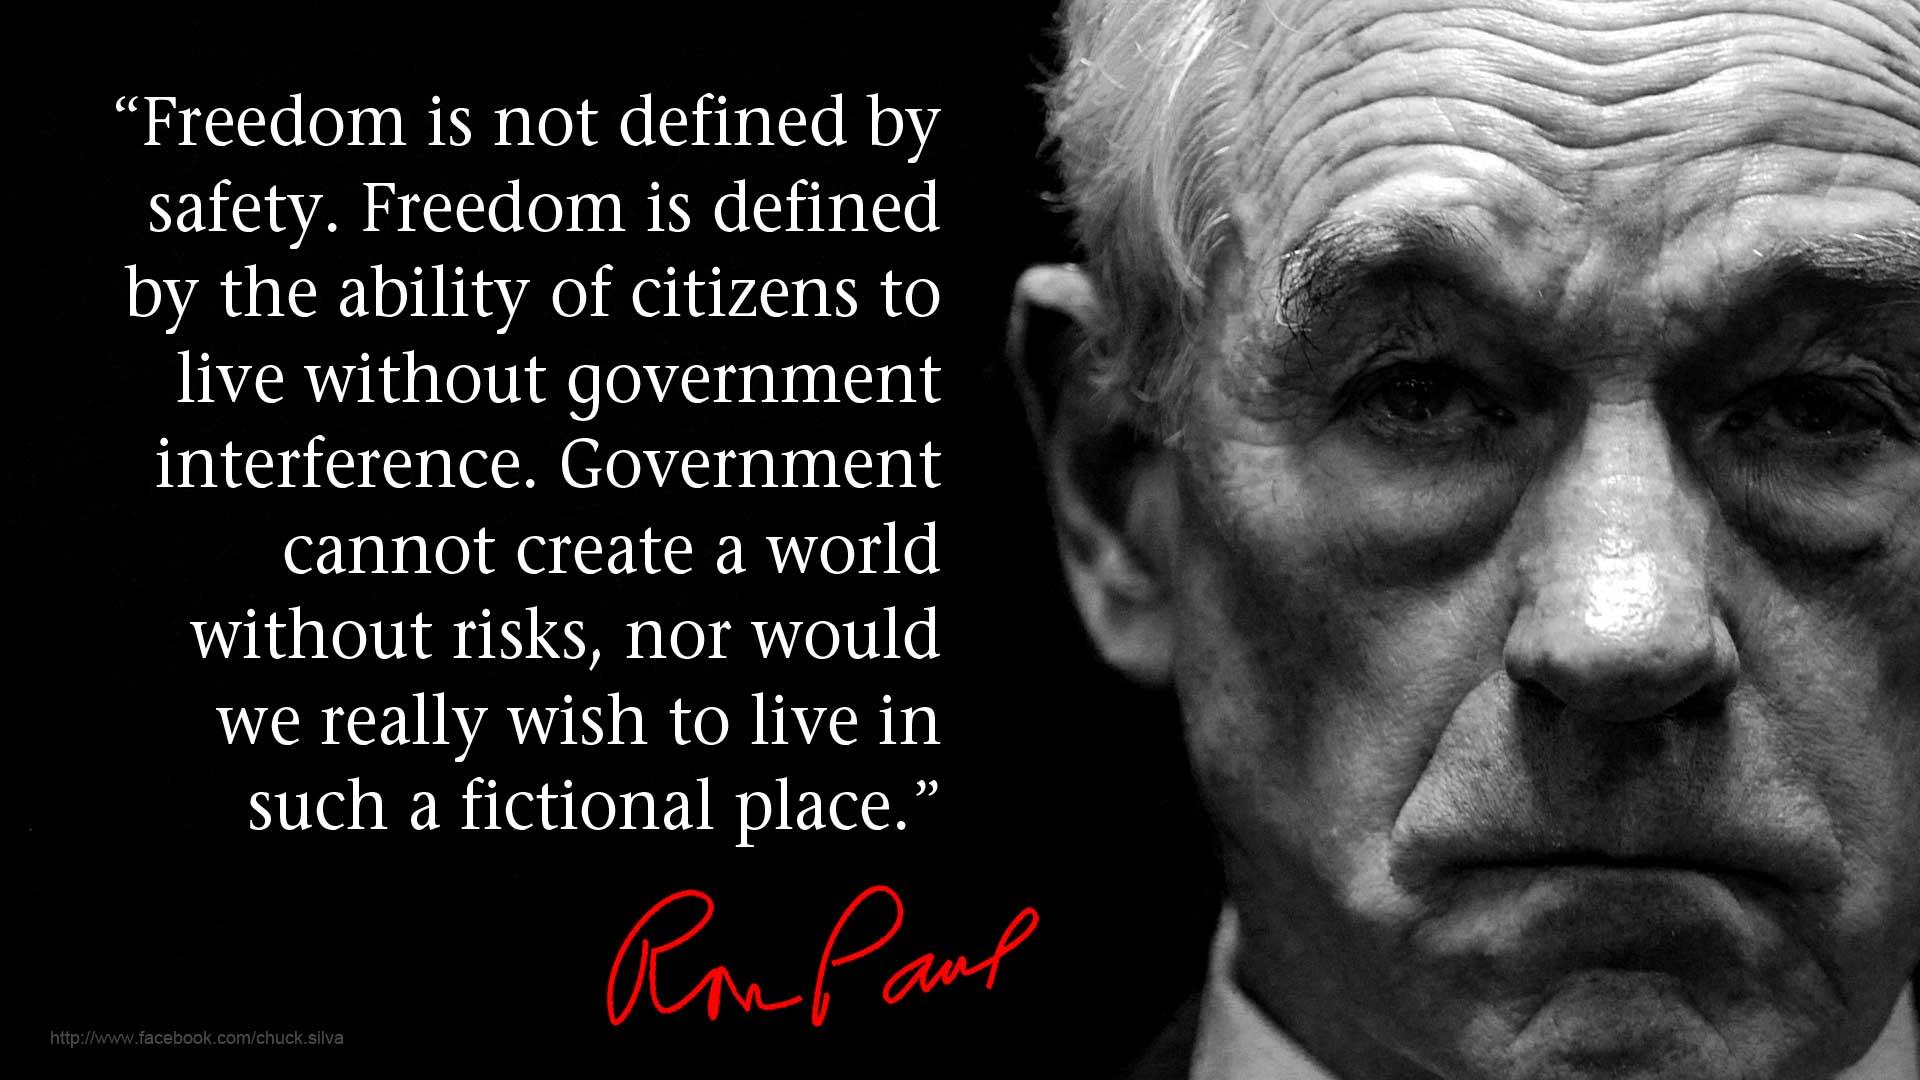 Harvey Specter Quotes Wallpaper Iphone Misc Political Ron Paul Politics Wallpaper